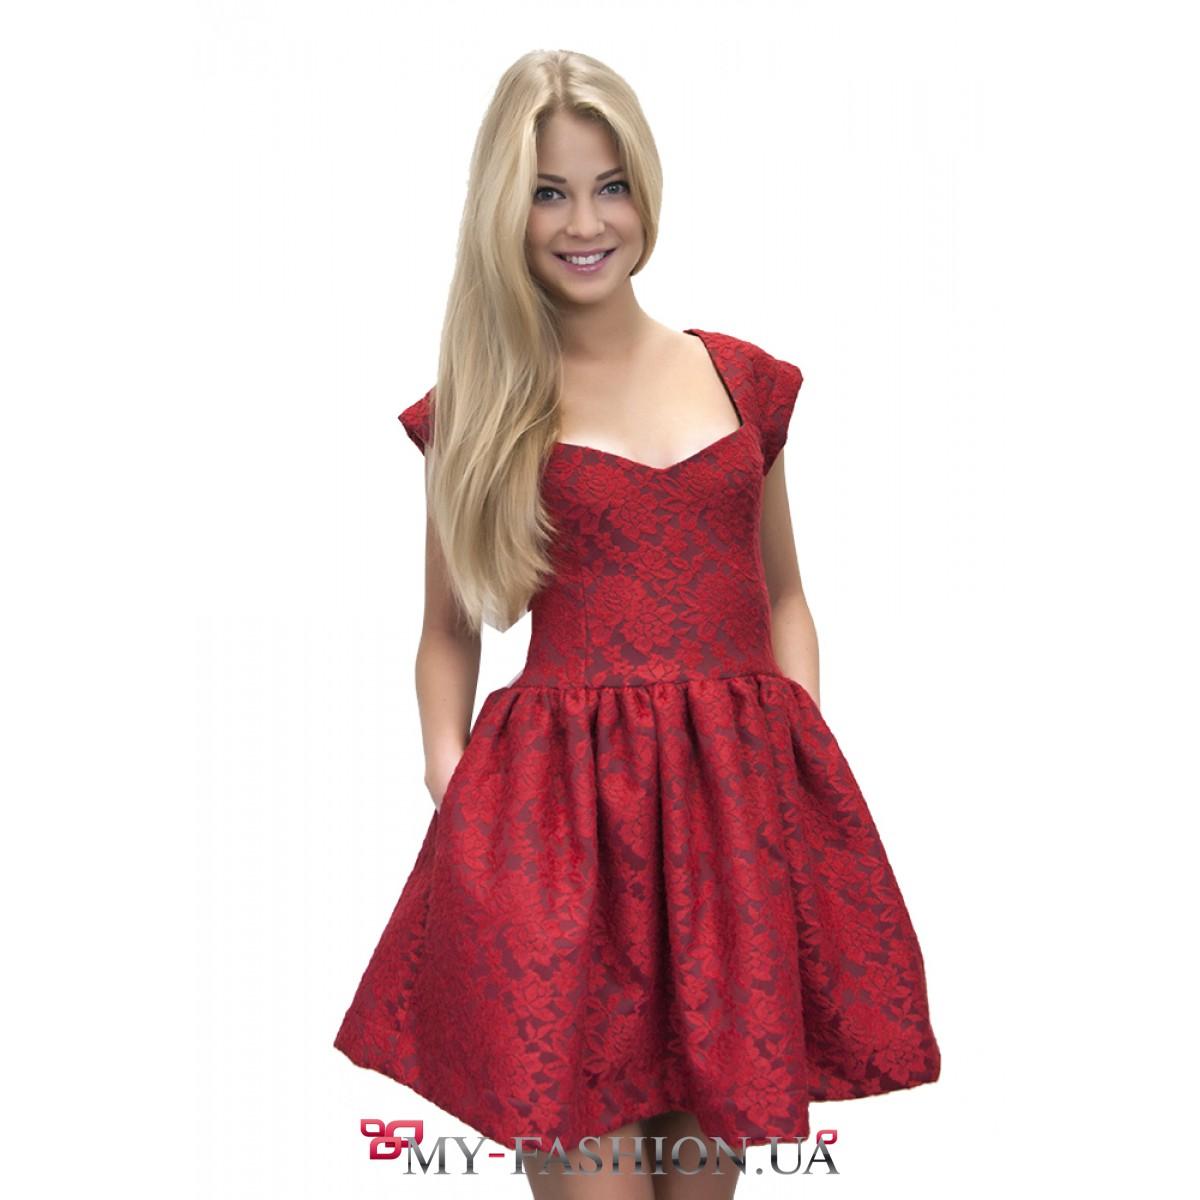 Ткань для красного платья фото